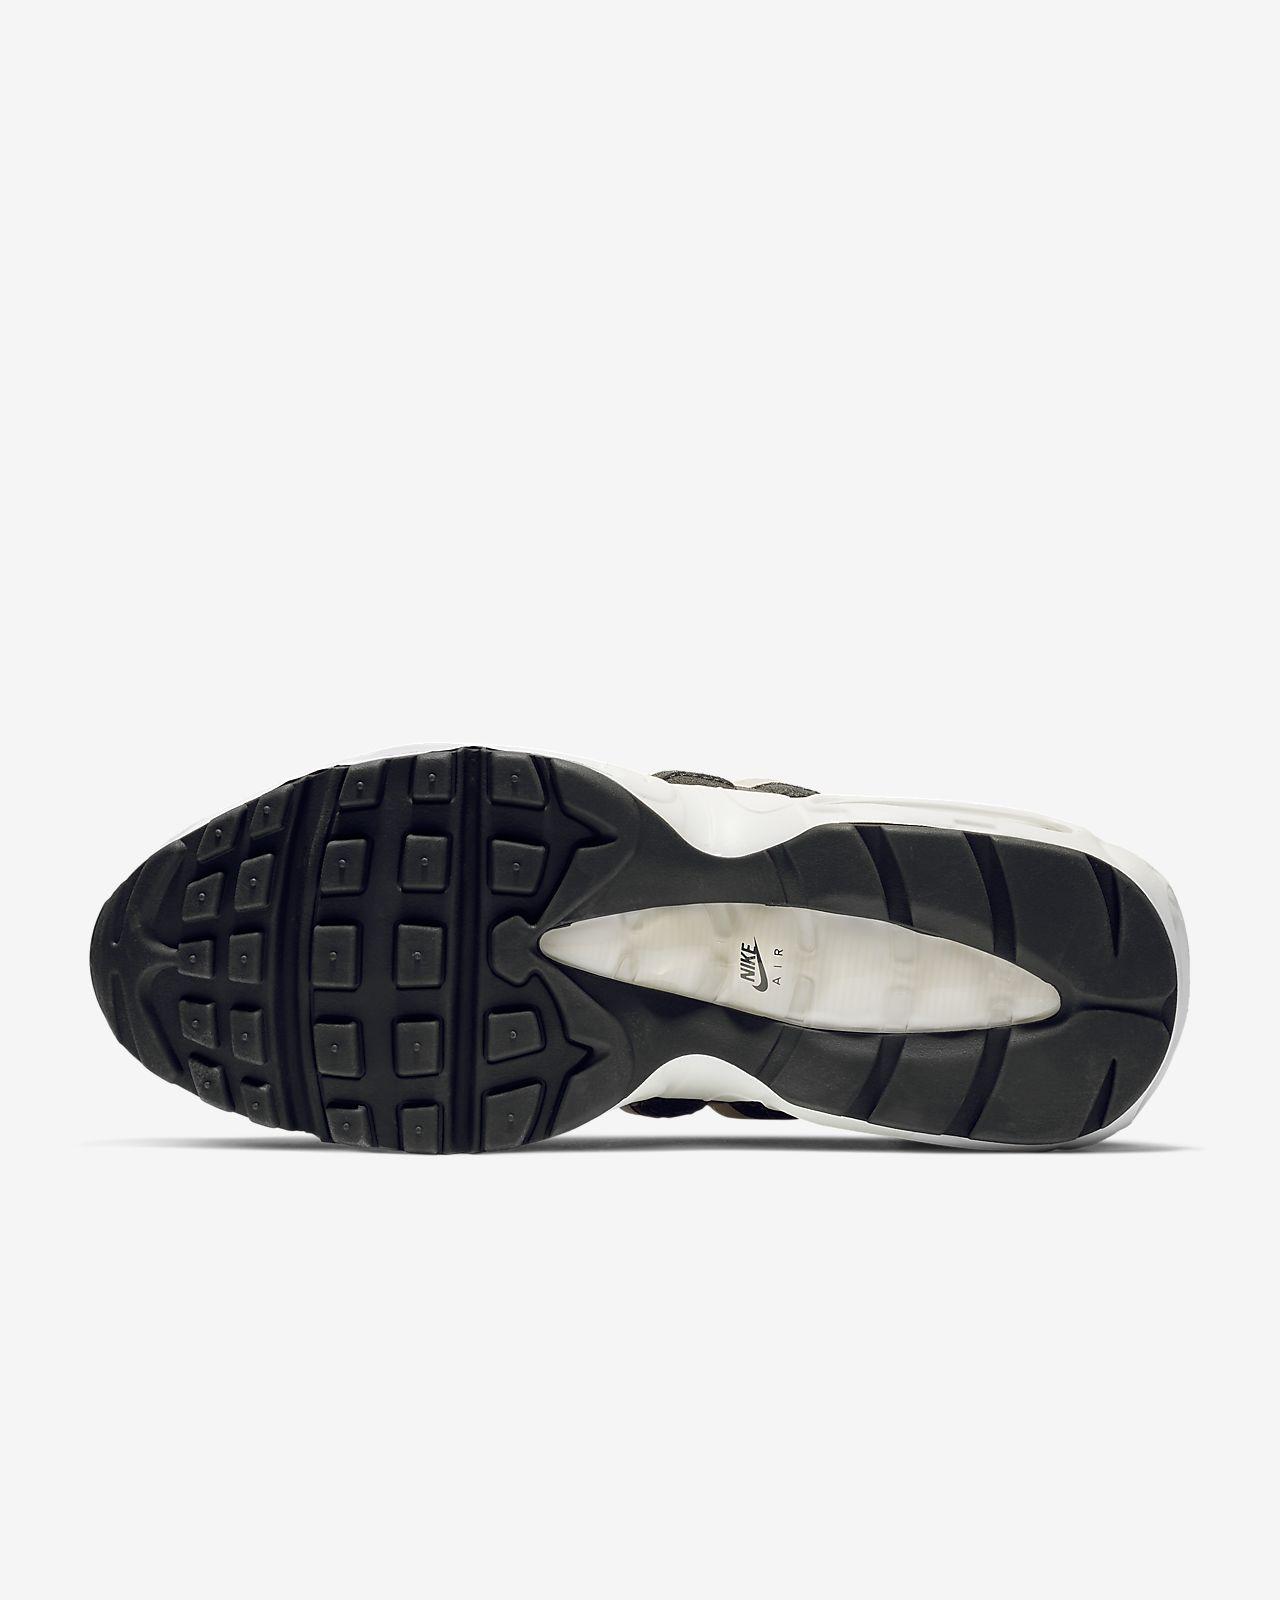 cb57913c55 Nike Air Max 95 Premium Women's Shoe. nike air max 95 black womens